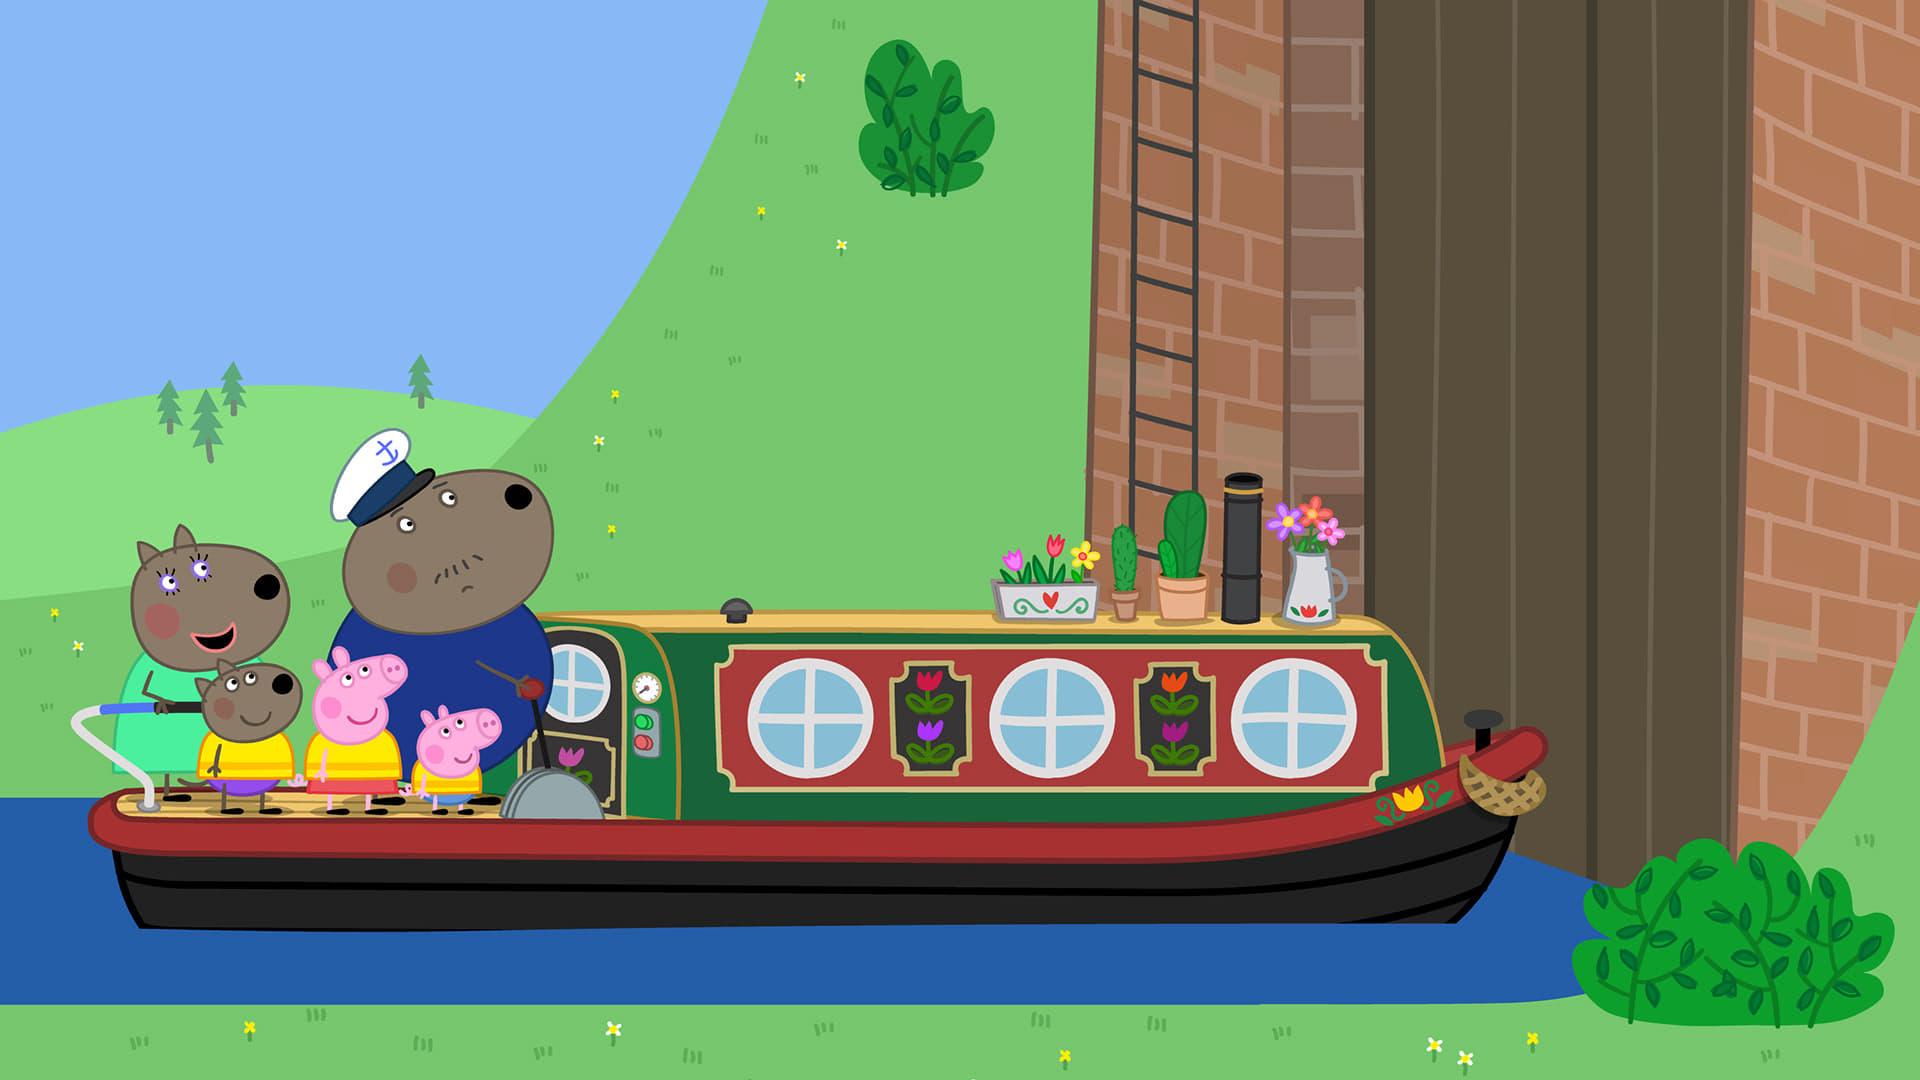 Peppa Pig Season 5 :Episode 18  Canal Boat